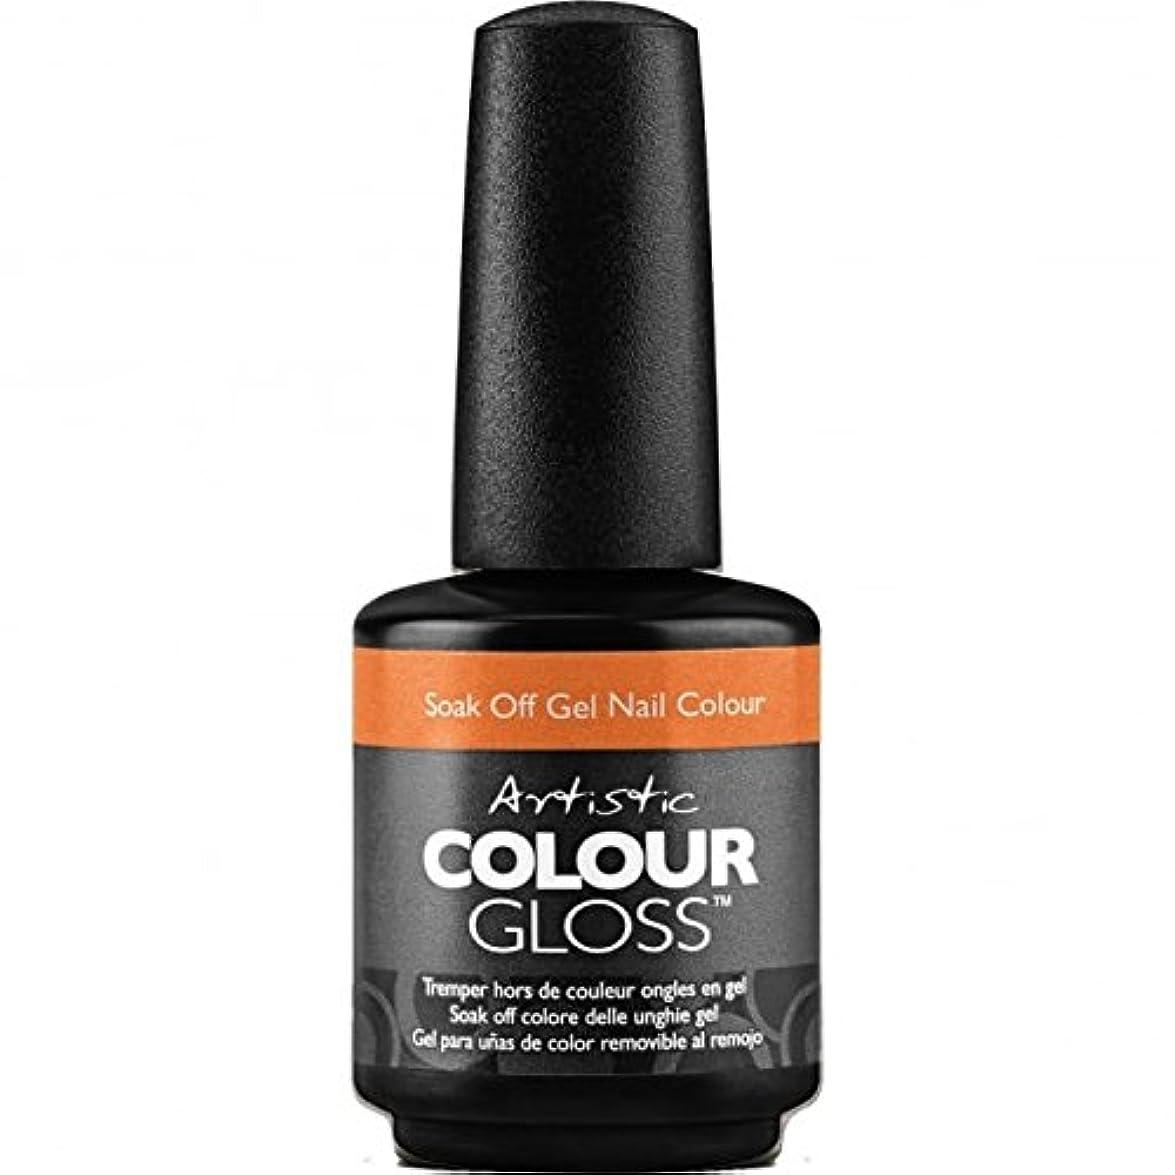 鉱石懐排泄物Artistic Colour Gloss - Crushed It - 0.5oz / 15ml